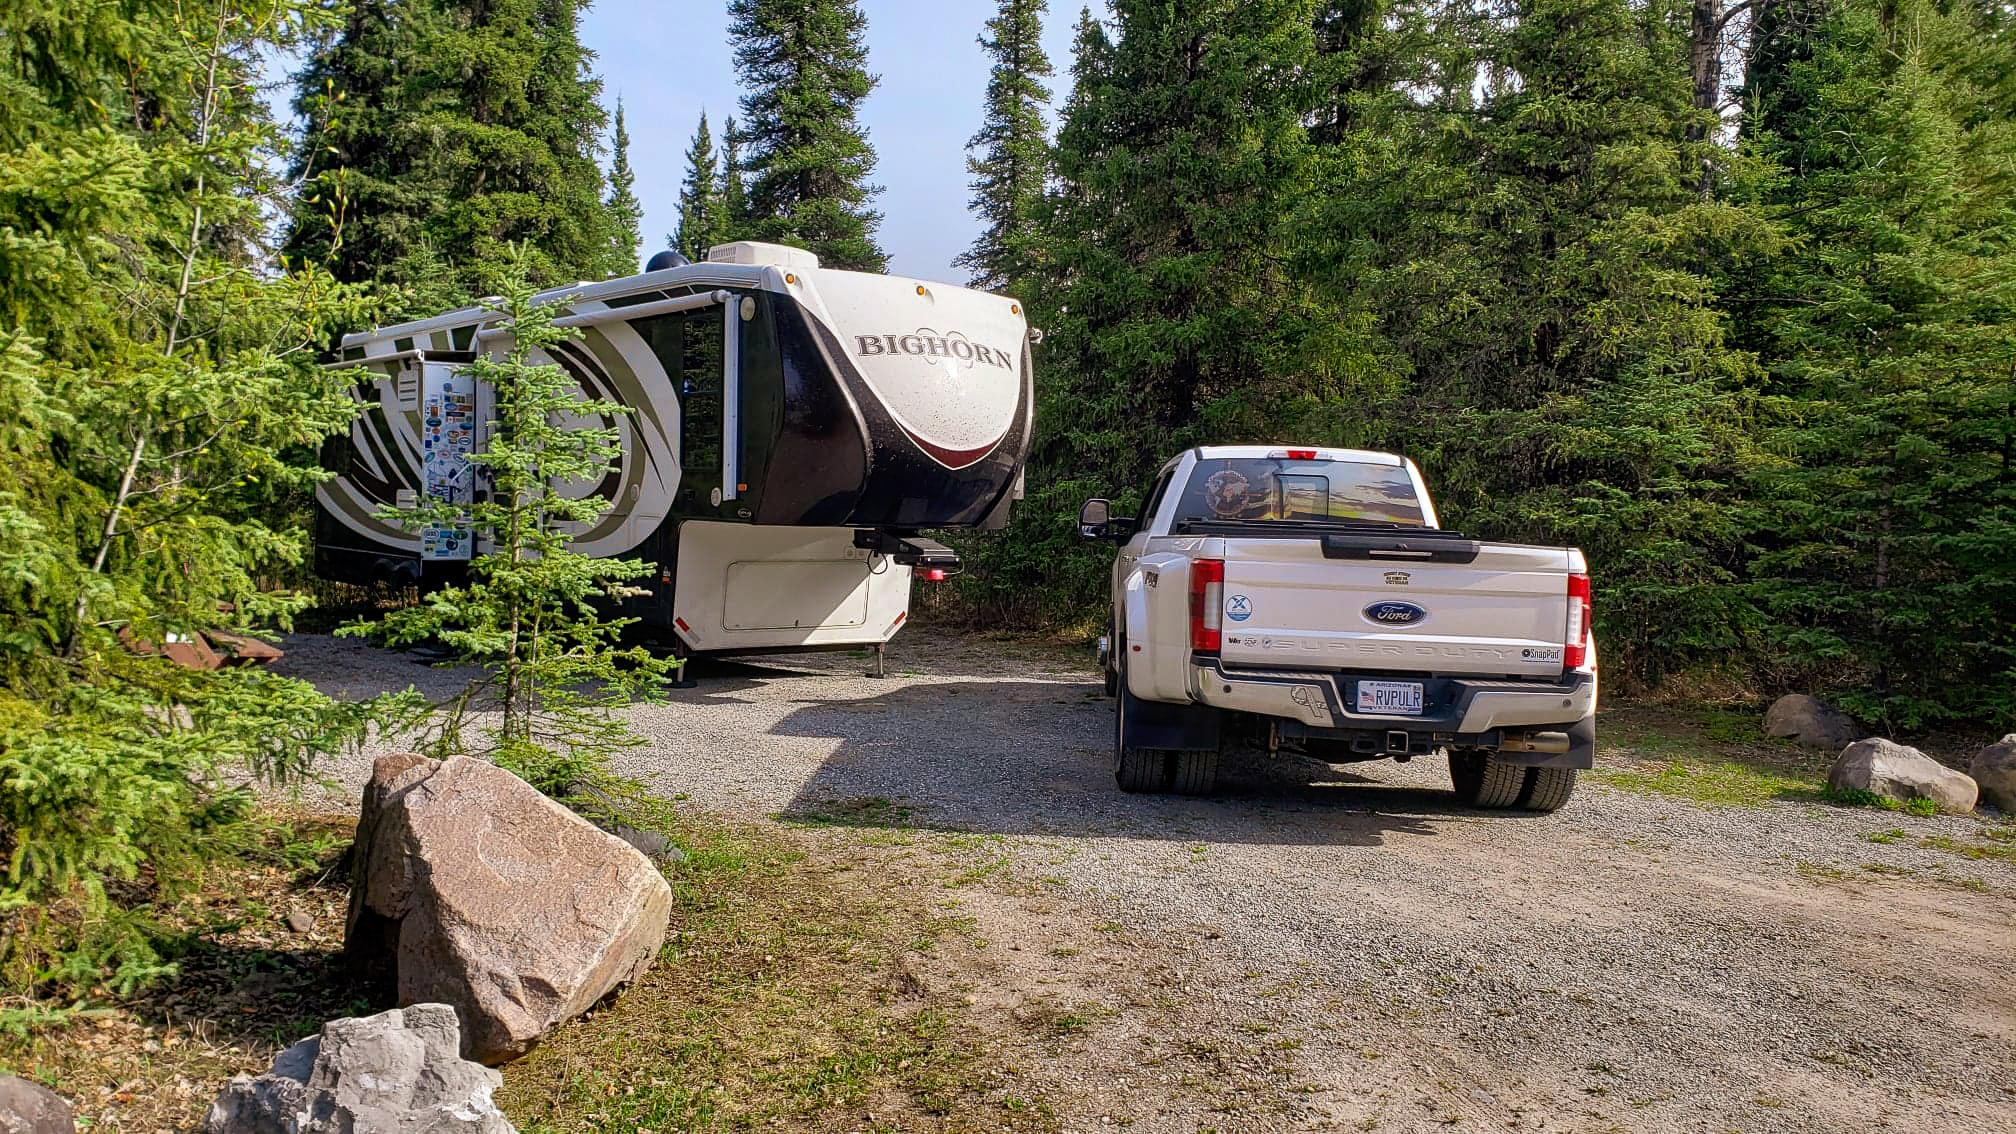 Buckinghorse River Wayside Provincial Park, British Columbia